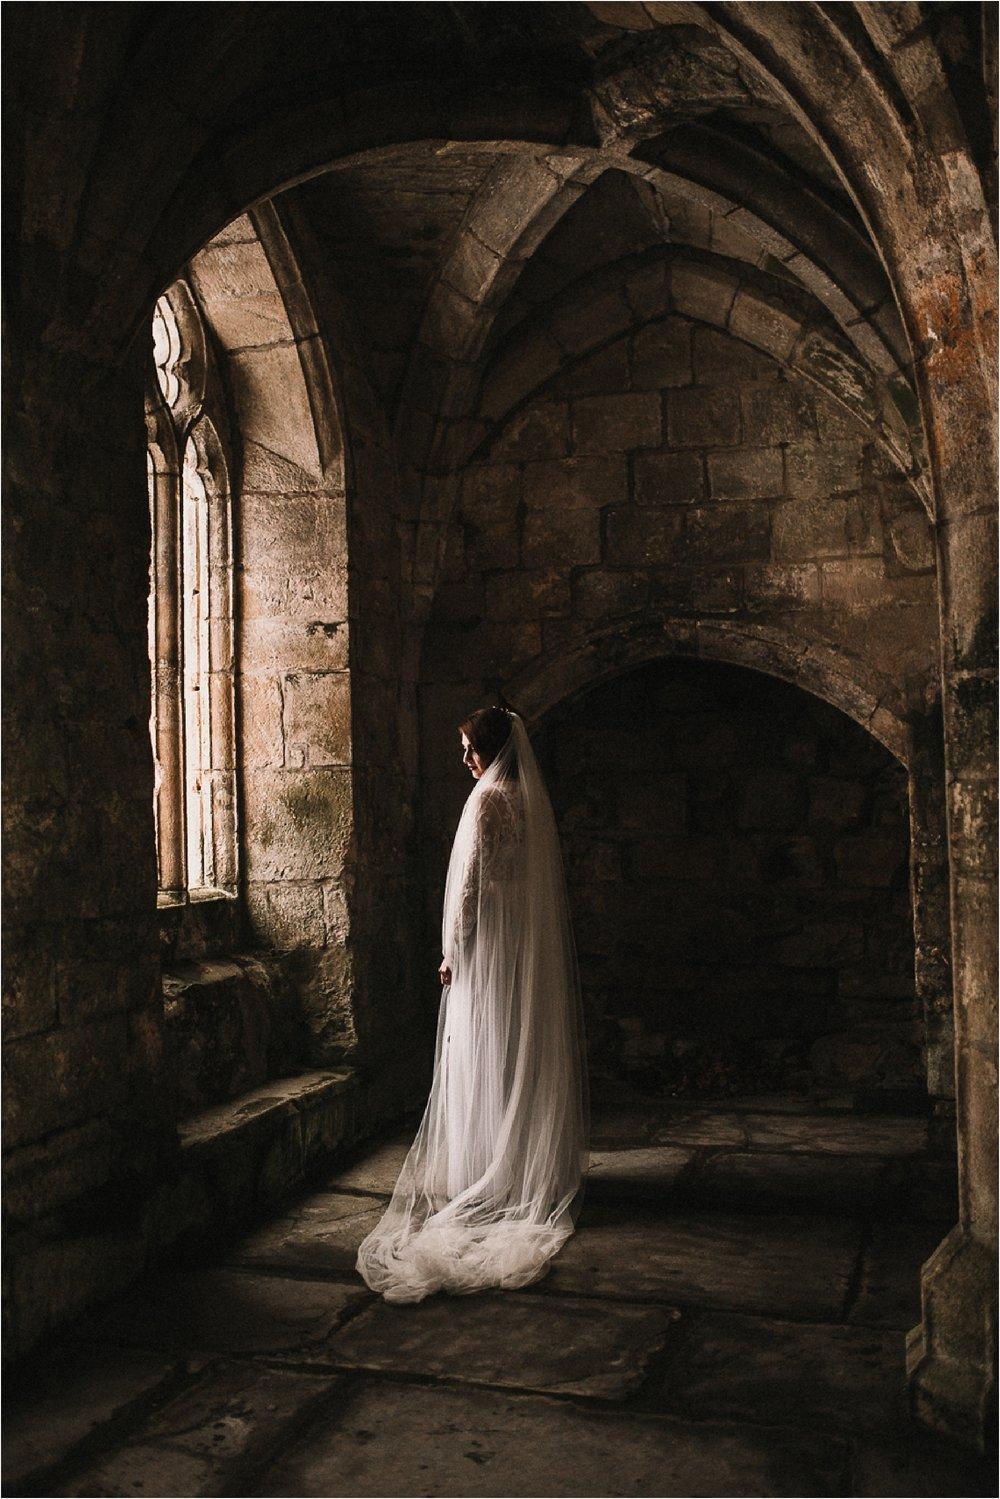 Valle-crucis-abbey-Llangollen-avonne-photography-79.jpg